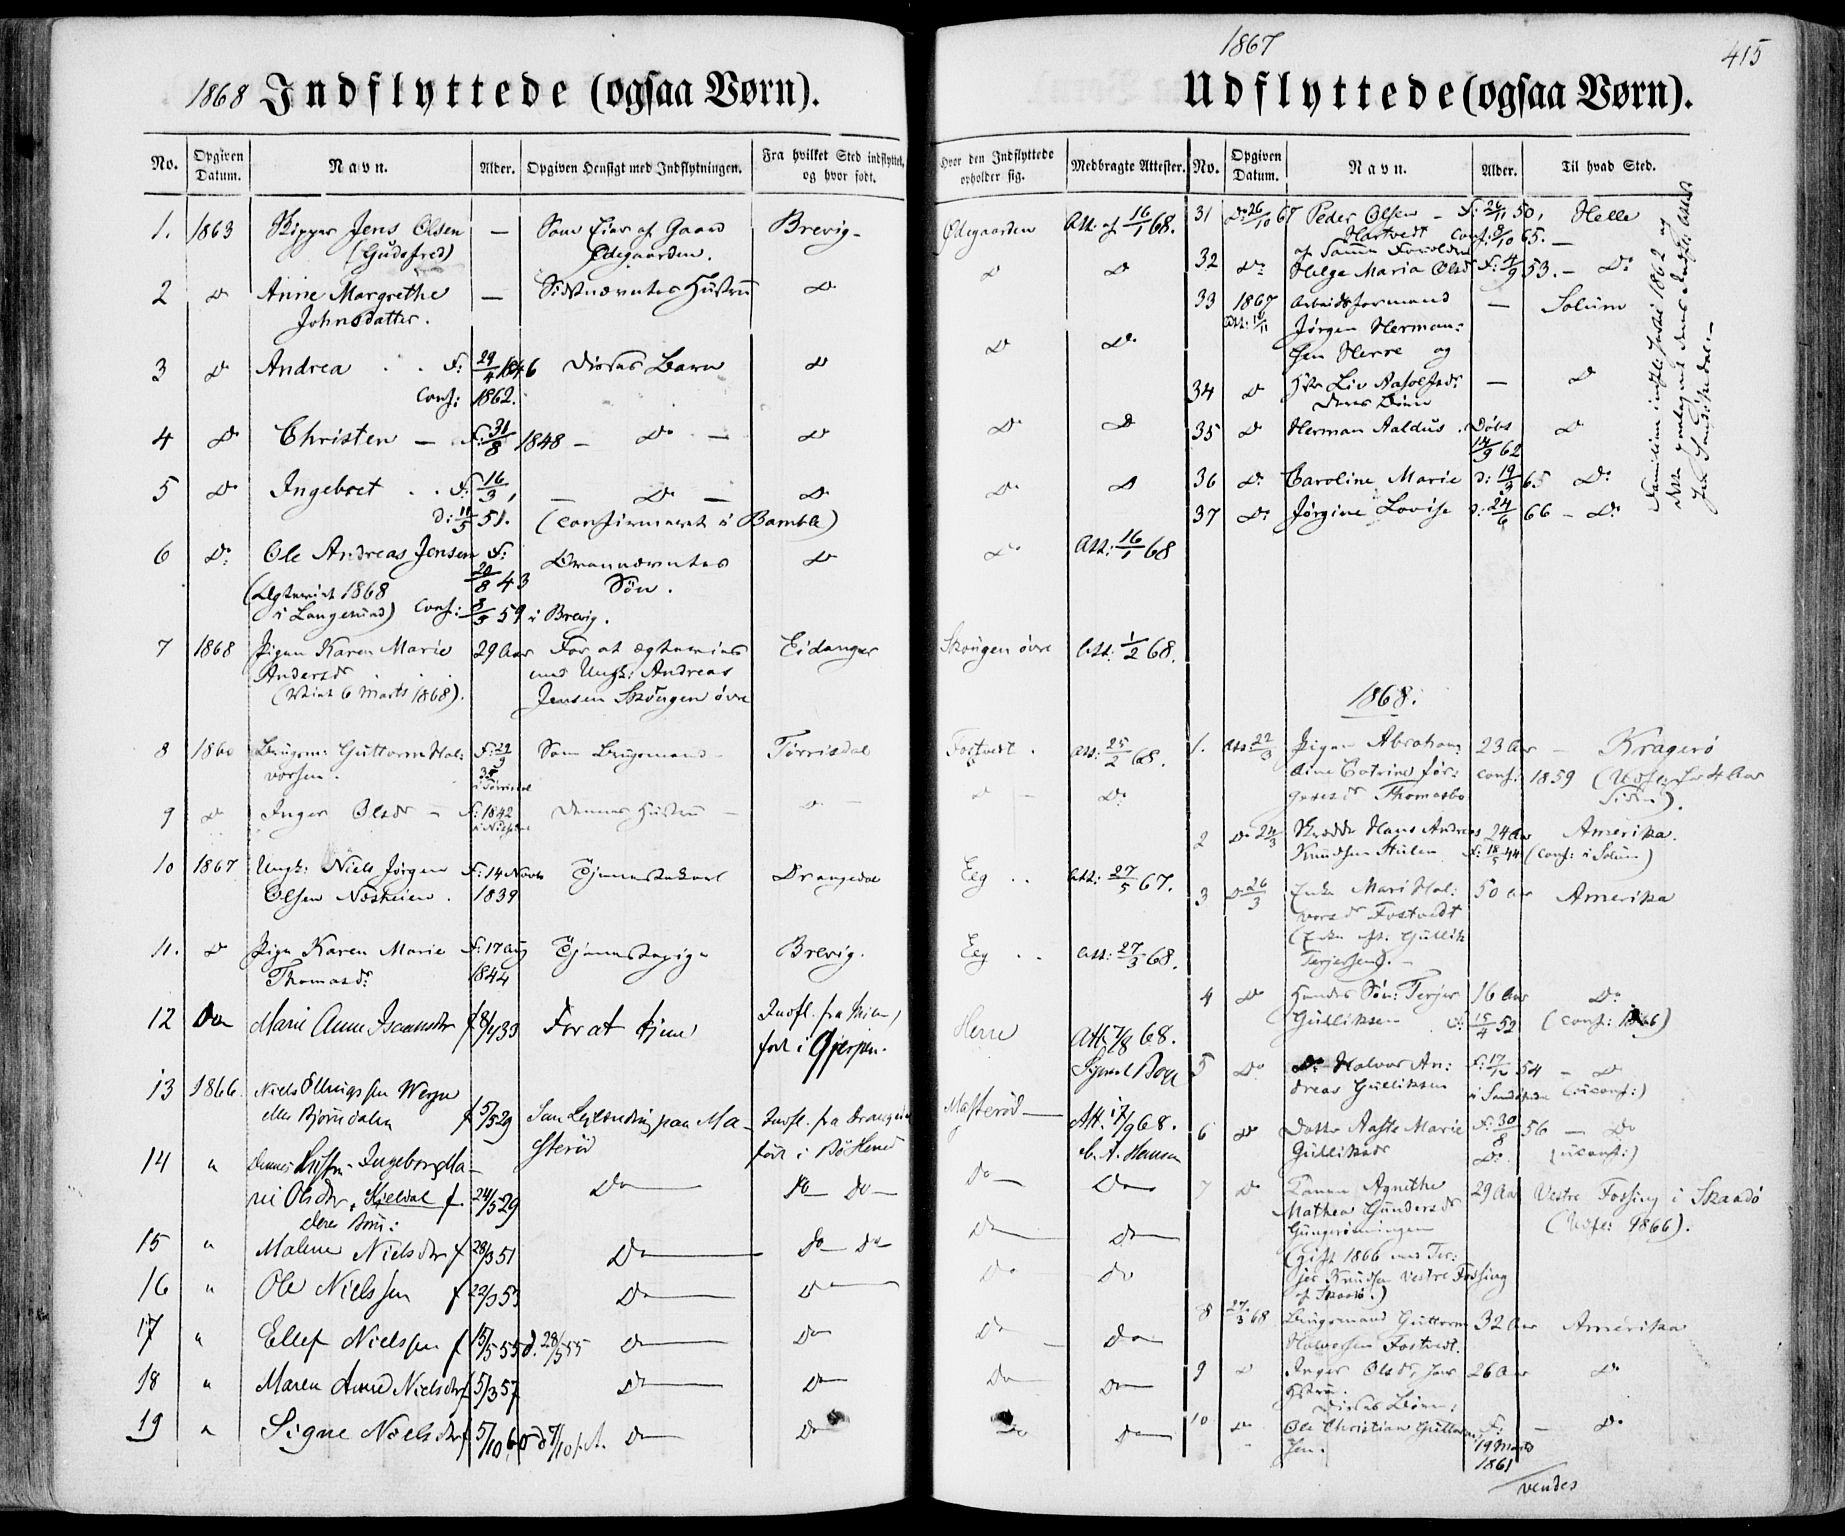 SAKO, Bamble kirkebøker, F/Fa/L0005: Ministerialbok nr. I 5, 1854-1869, s. 415